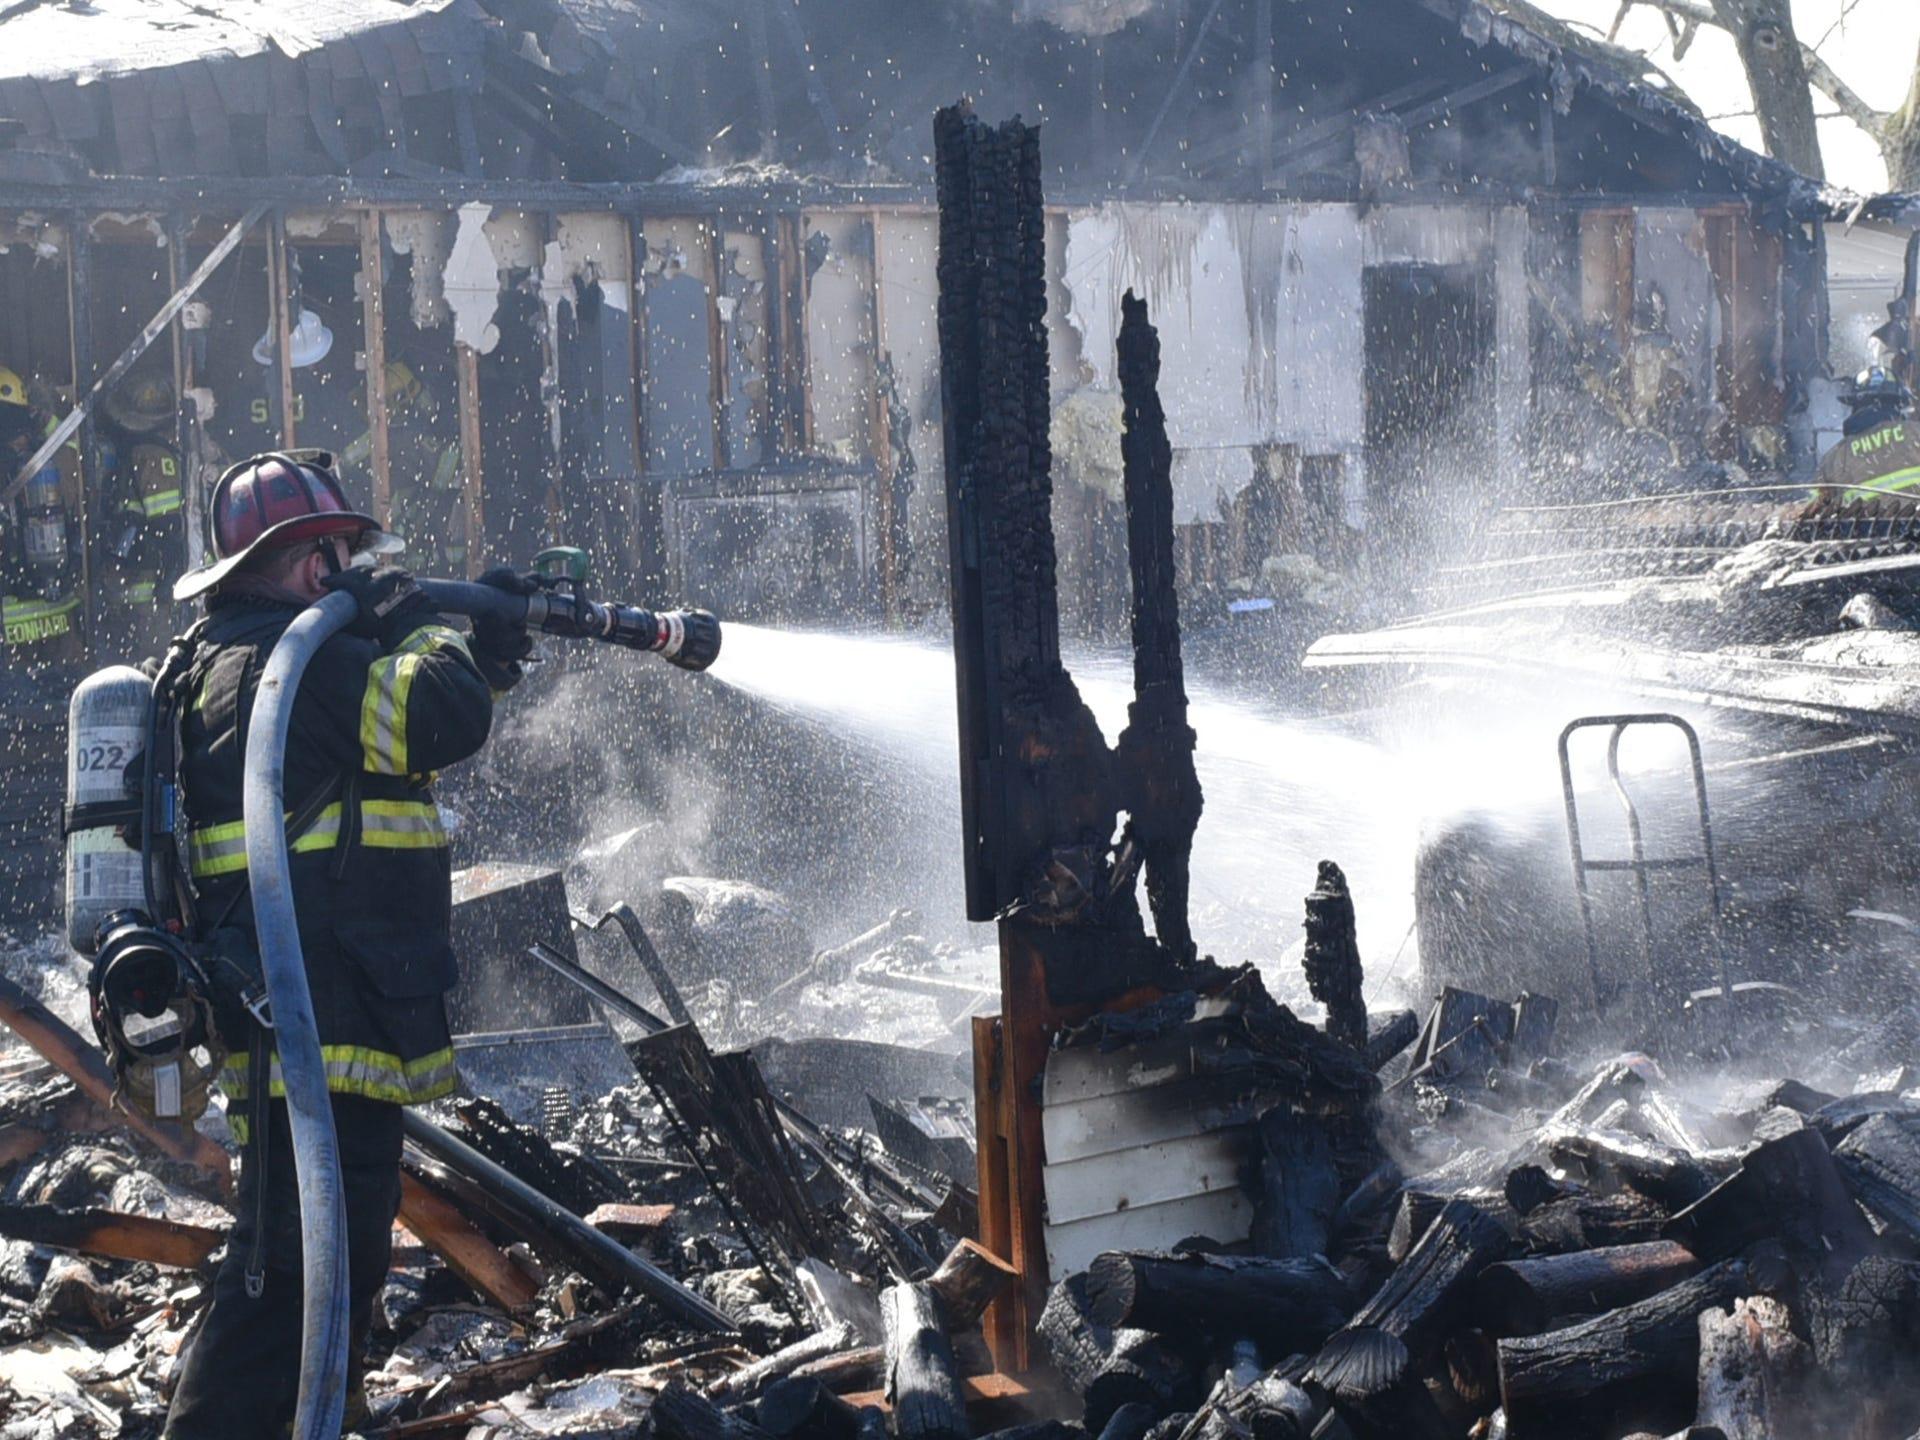 PHOTOS: Fire destroys house garage in Lurgan Township